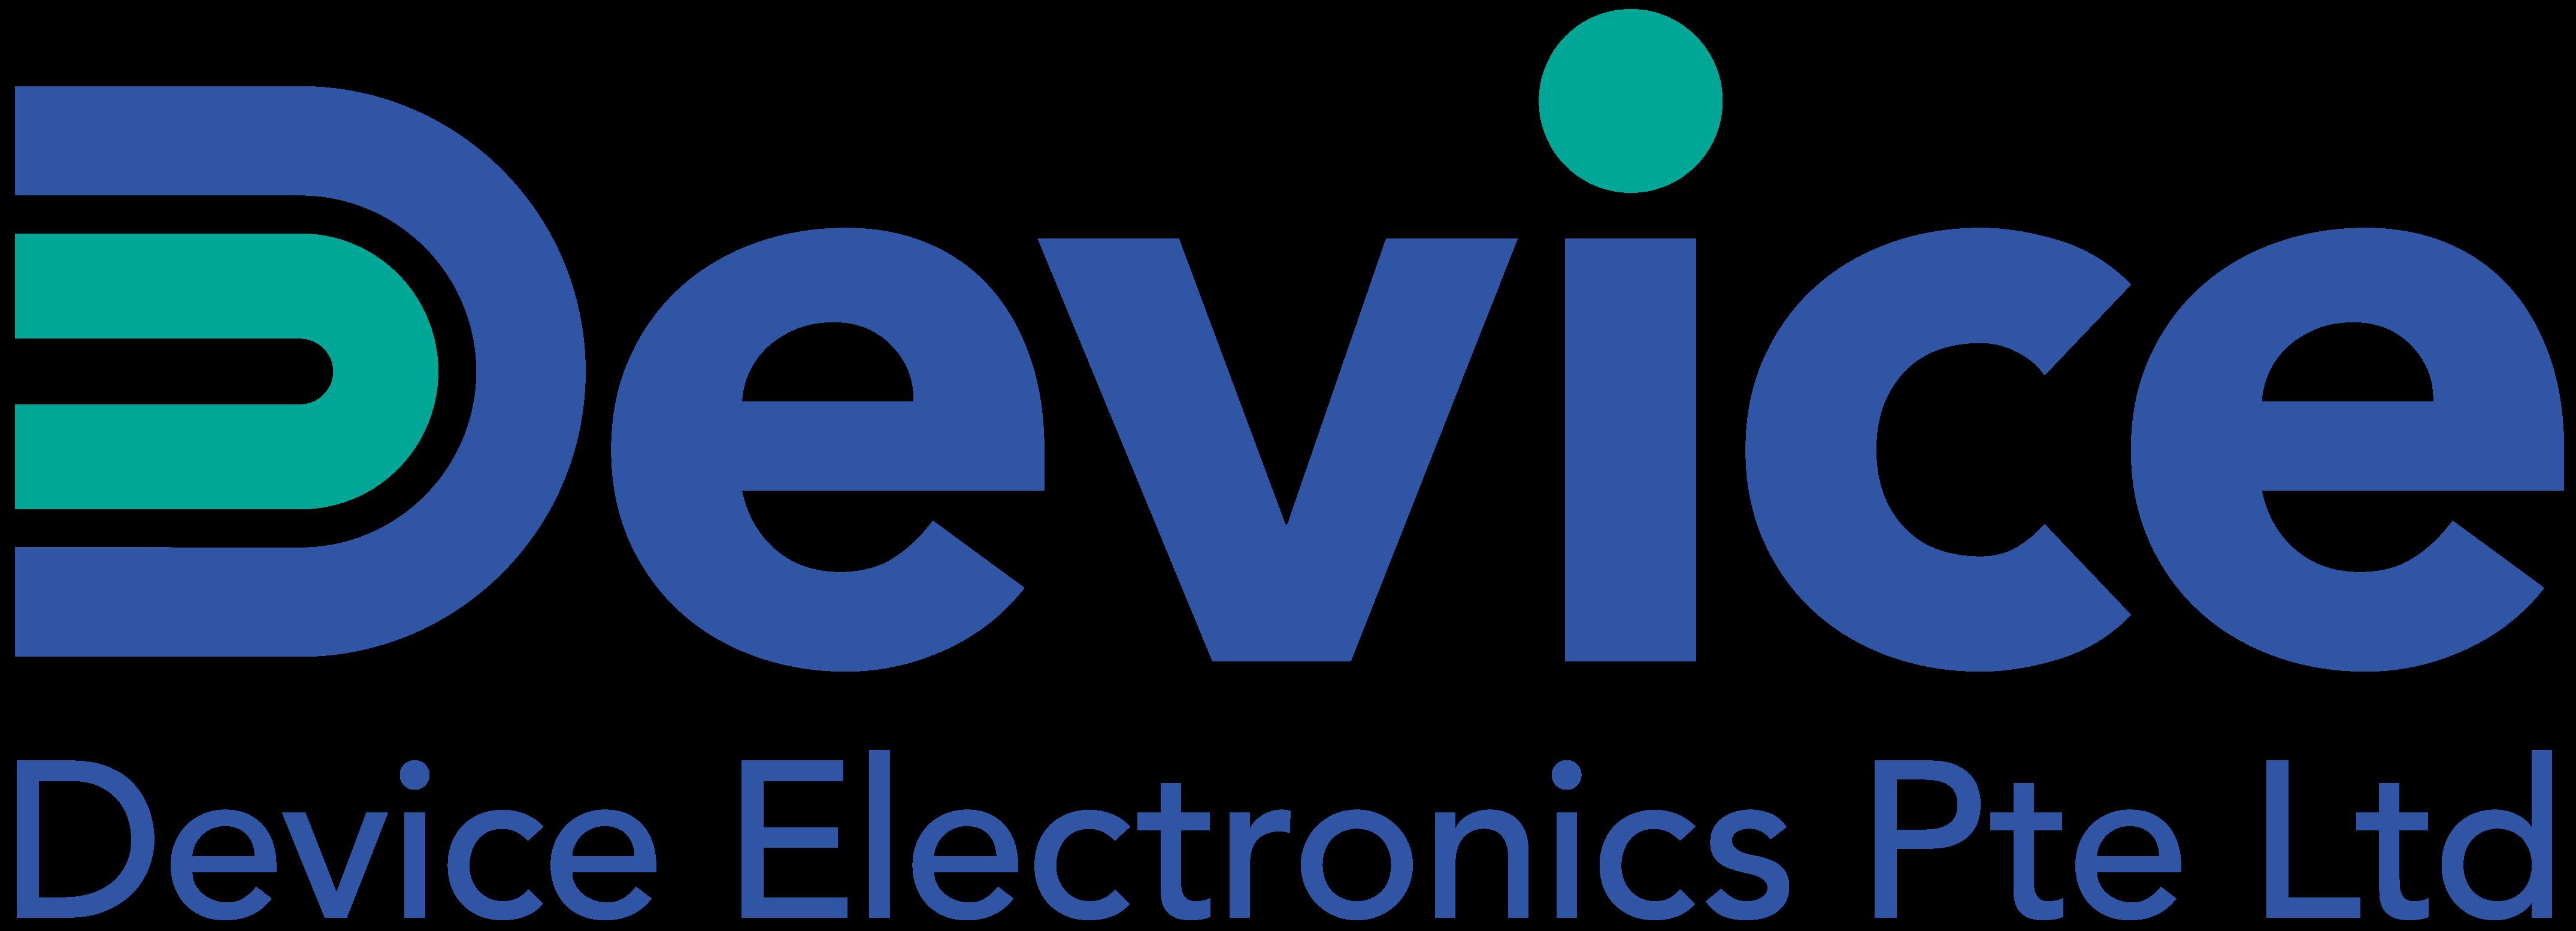 Device Electronics Pte. Ltd.